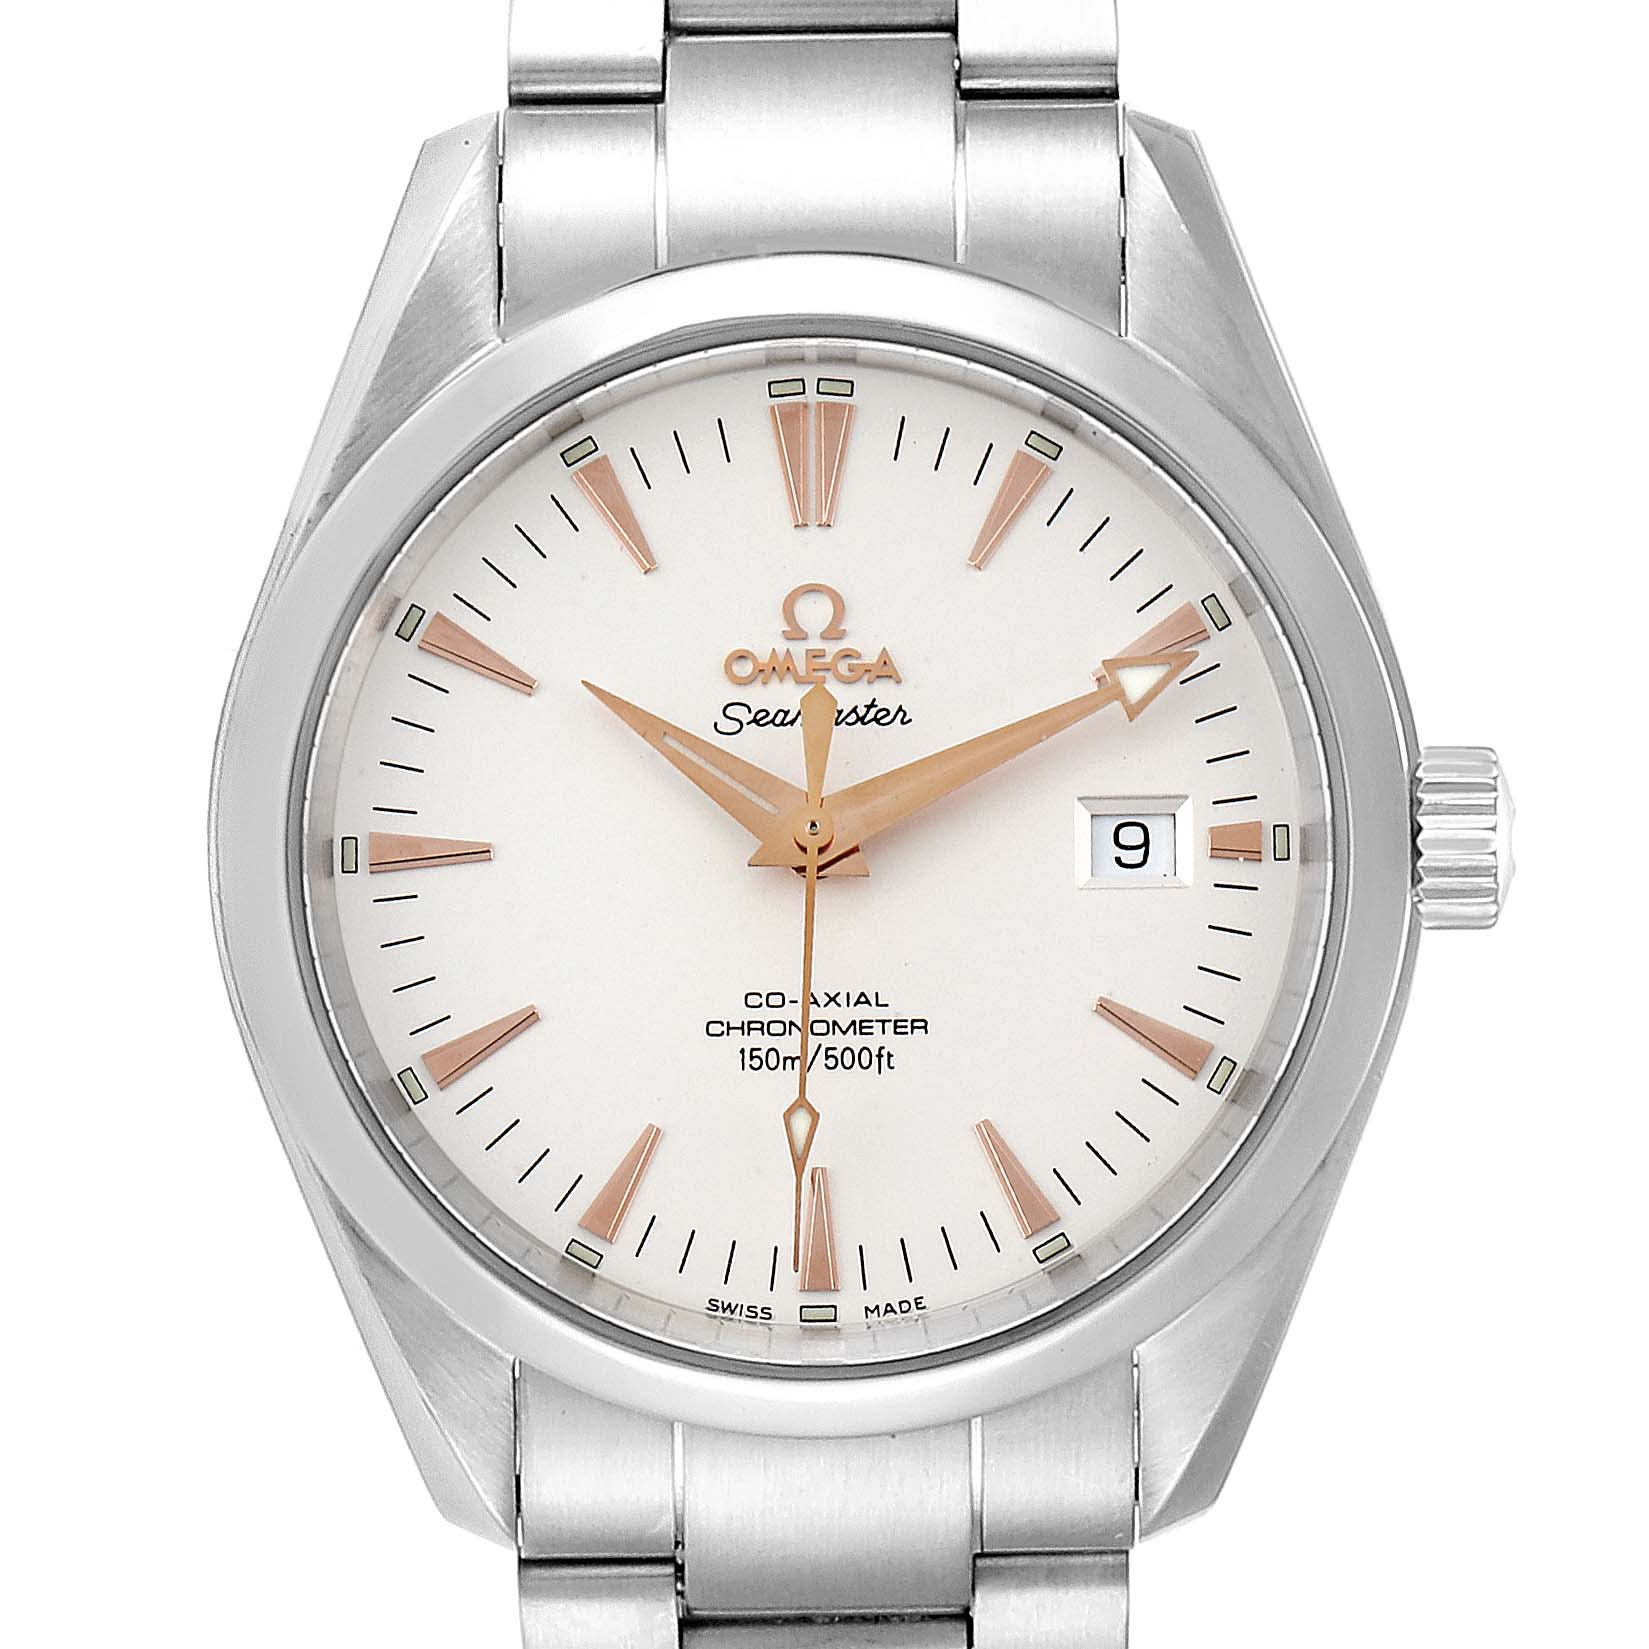 Omega Seamaster Aqua Terra Mens Steel Watch 2503.34.00 Box Papers